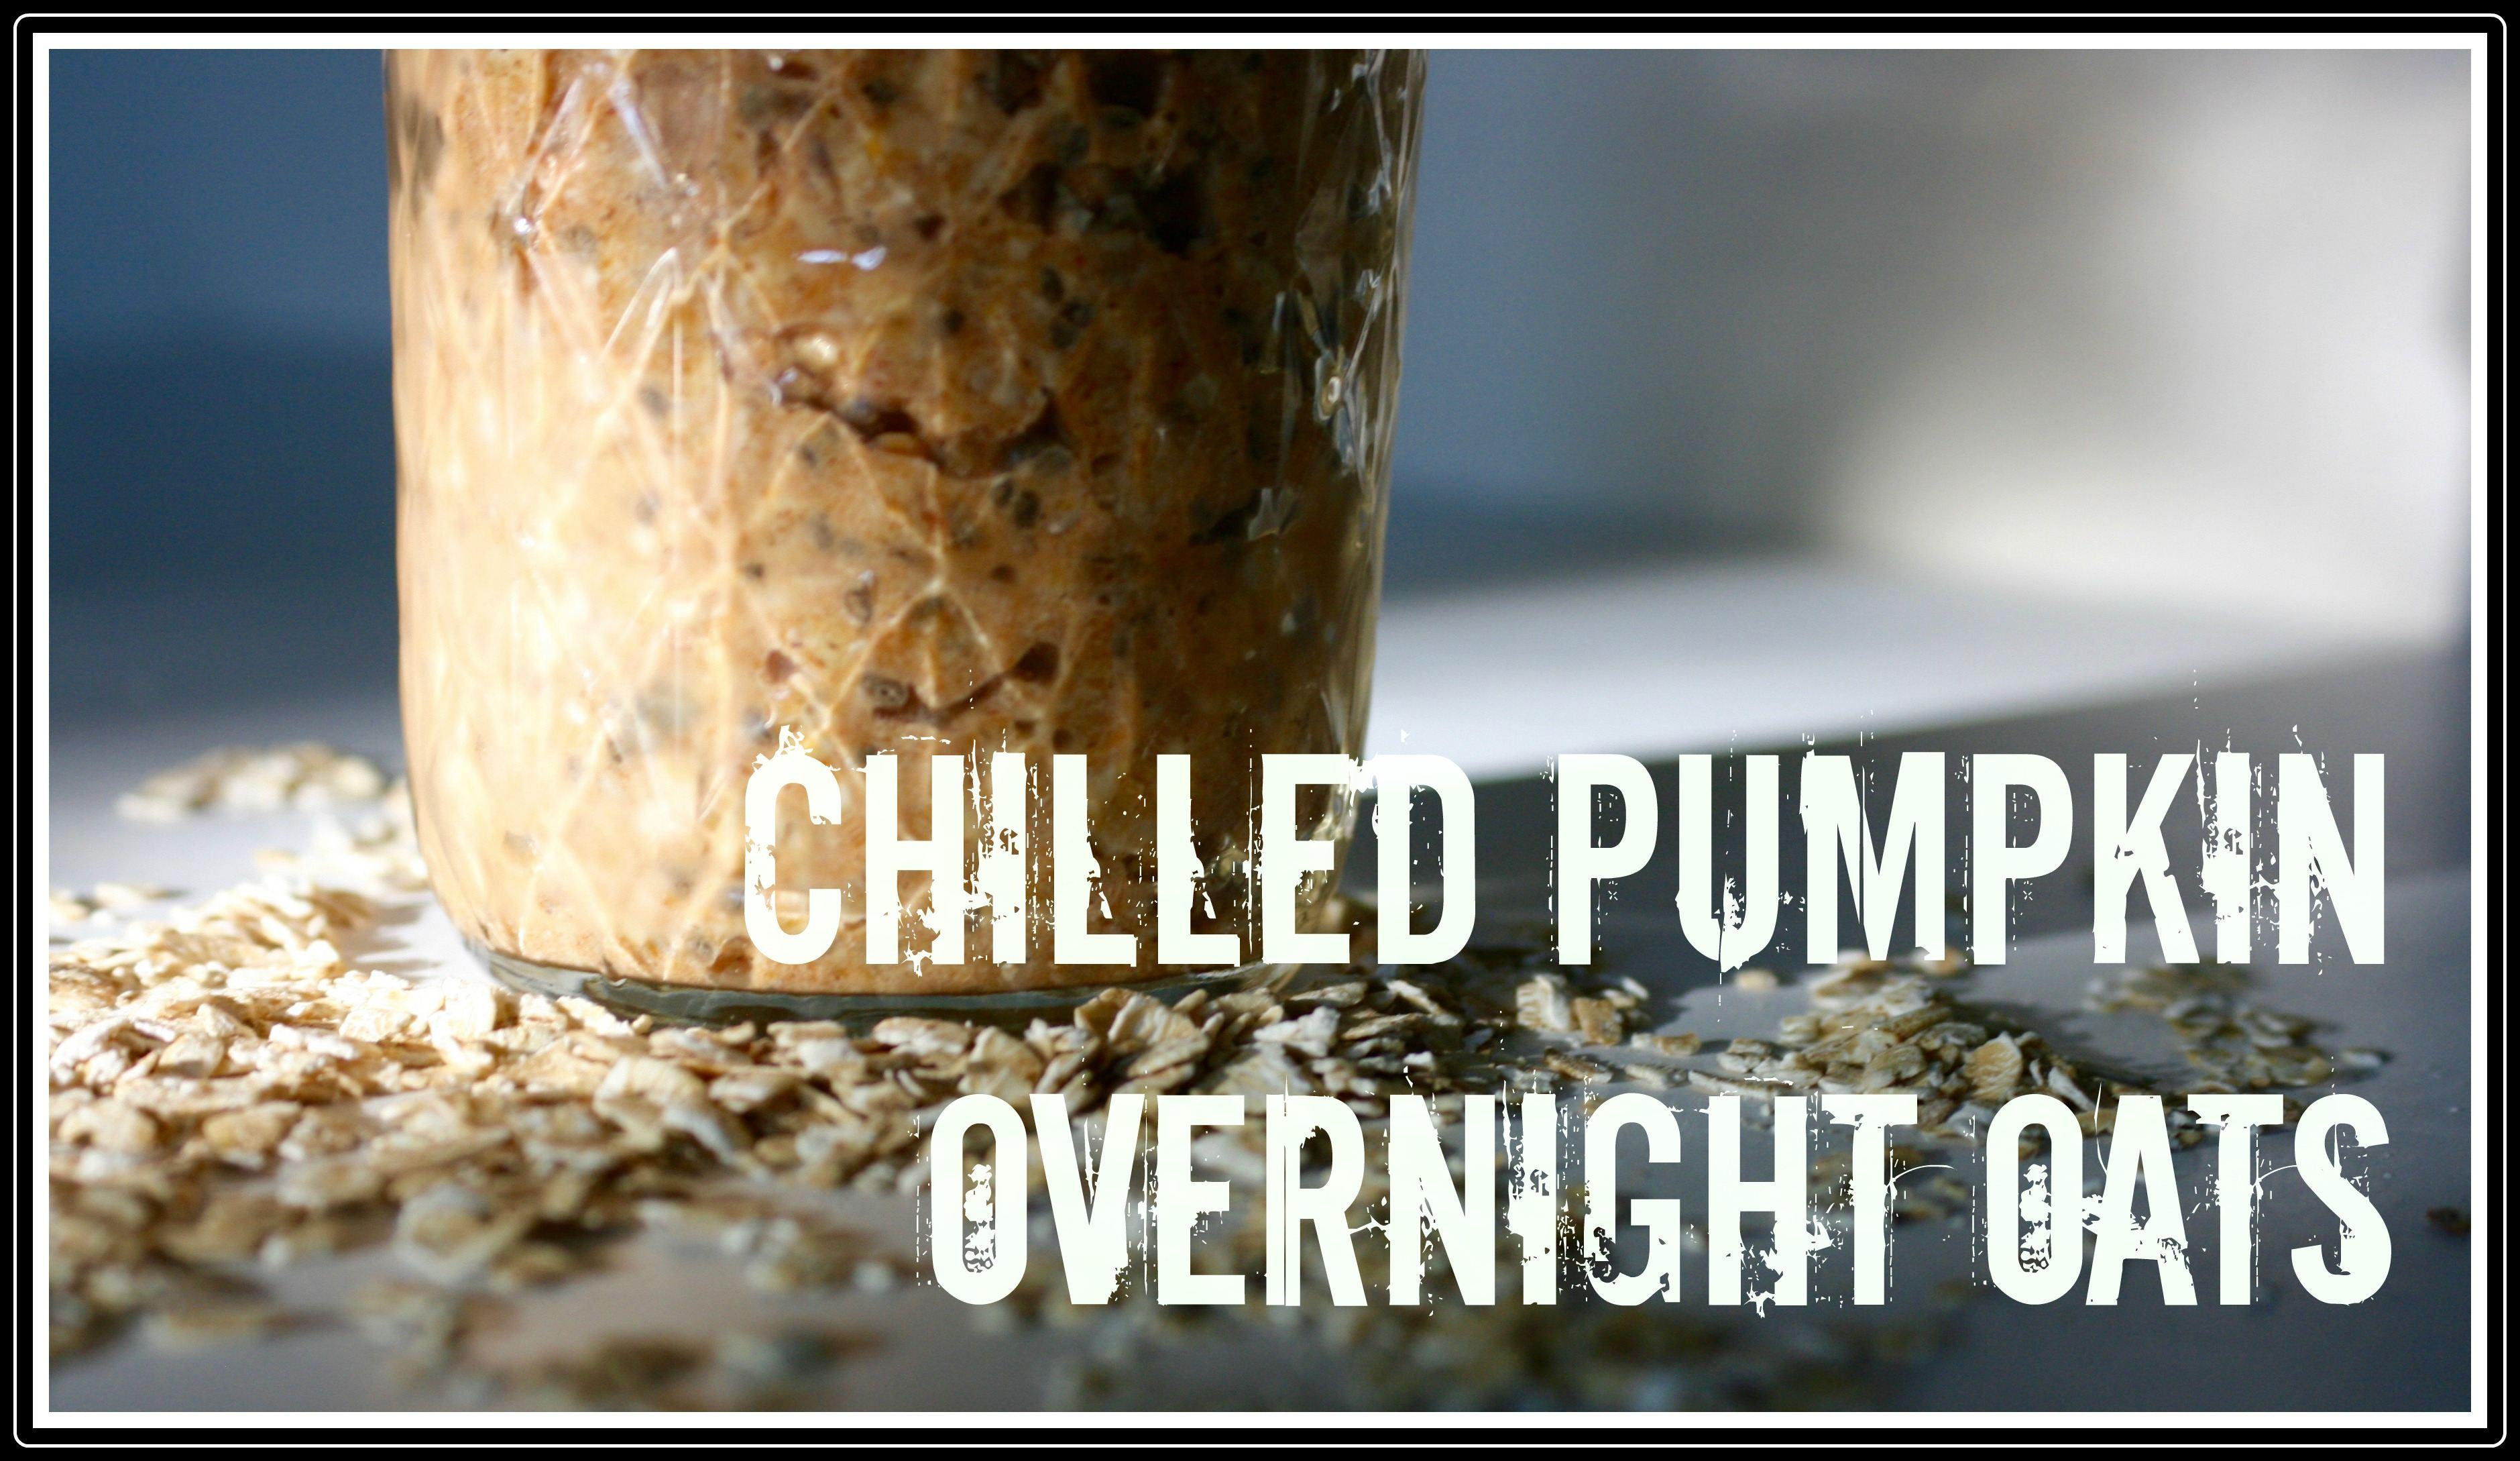 Chilled Pumpkin Oatmeal featured